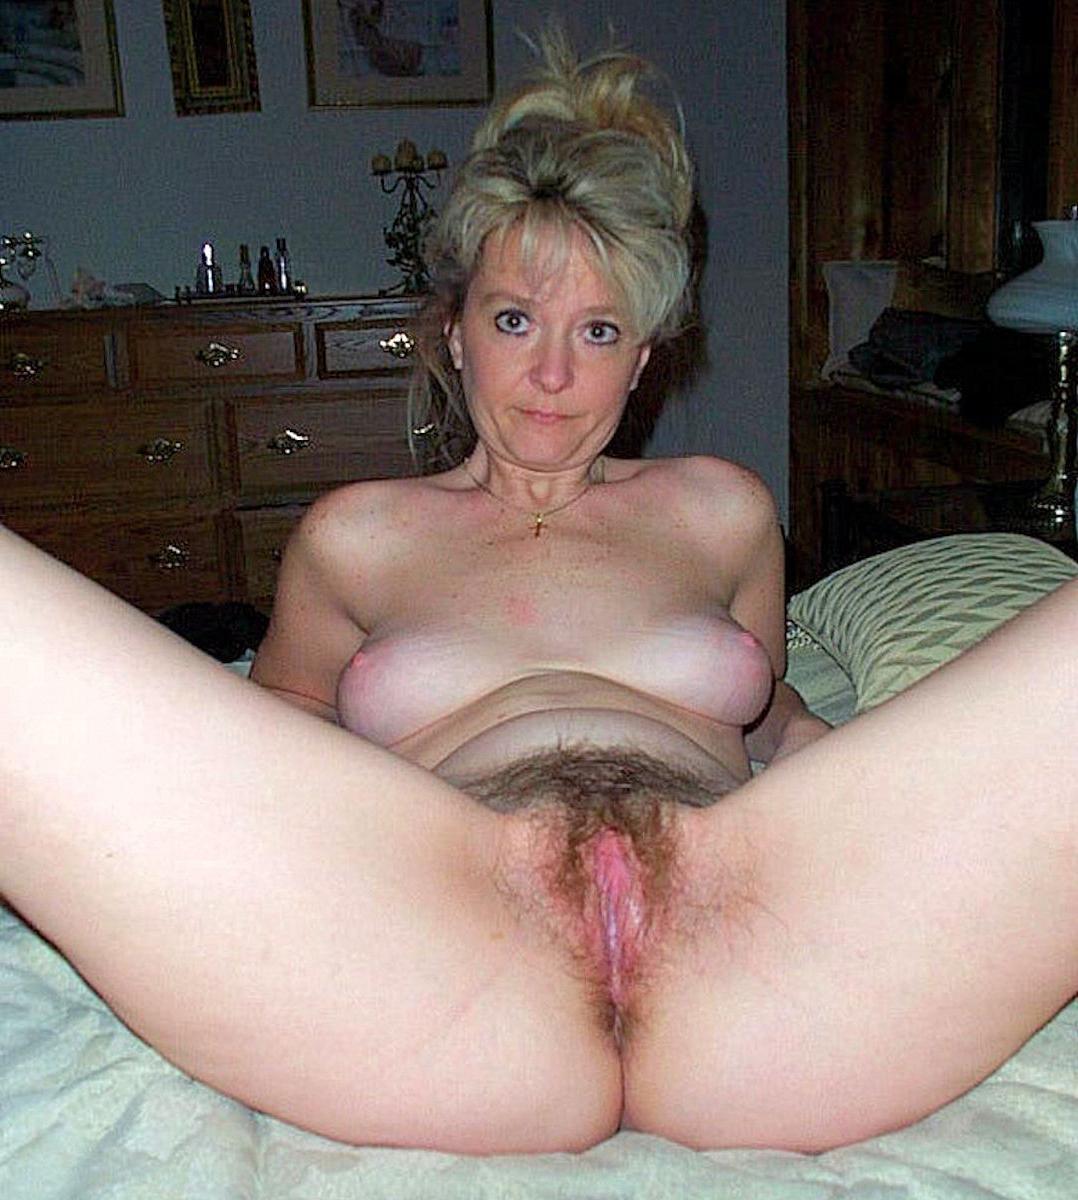 Horny natural beauty women